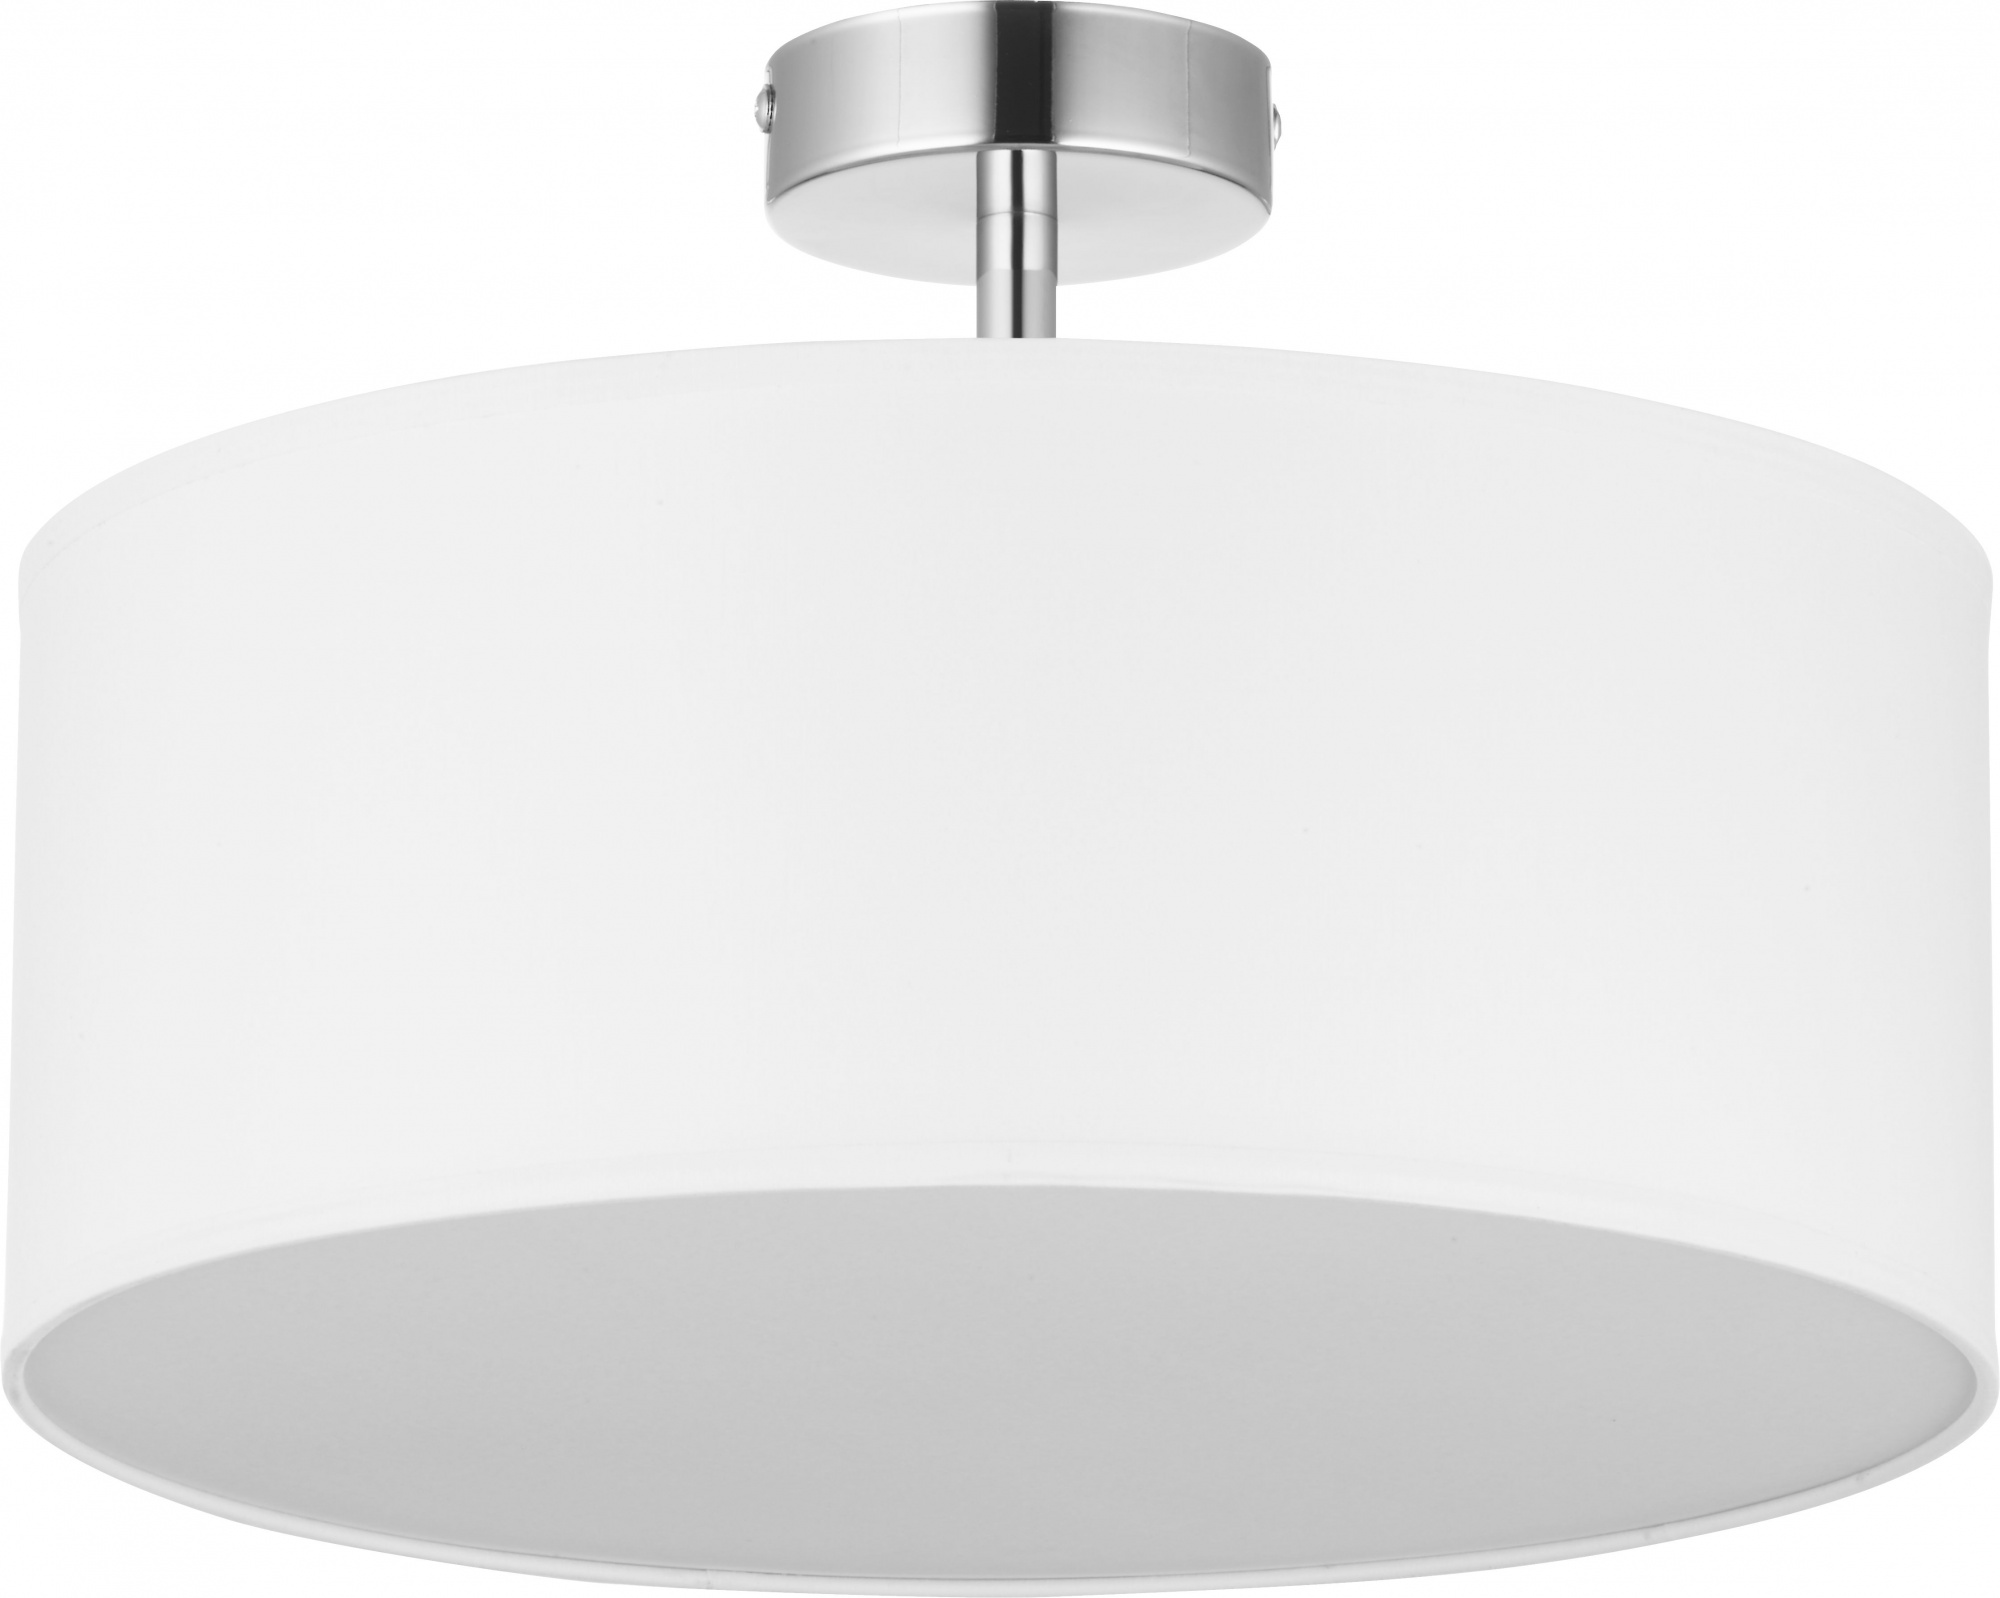 TK Lighting TK-4243 Vienna mennyezeti lámpa